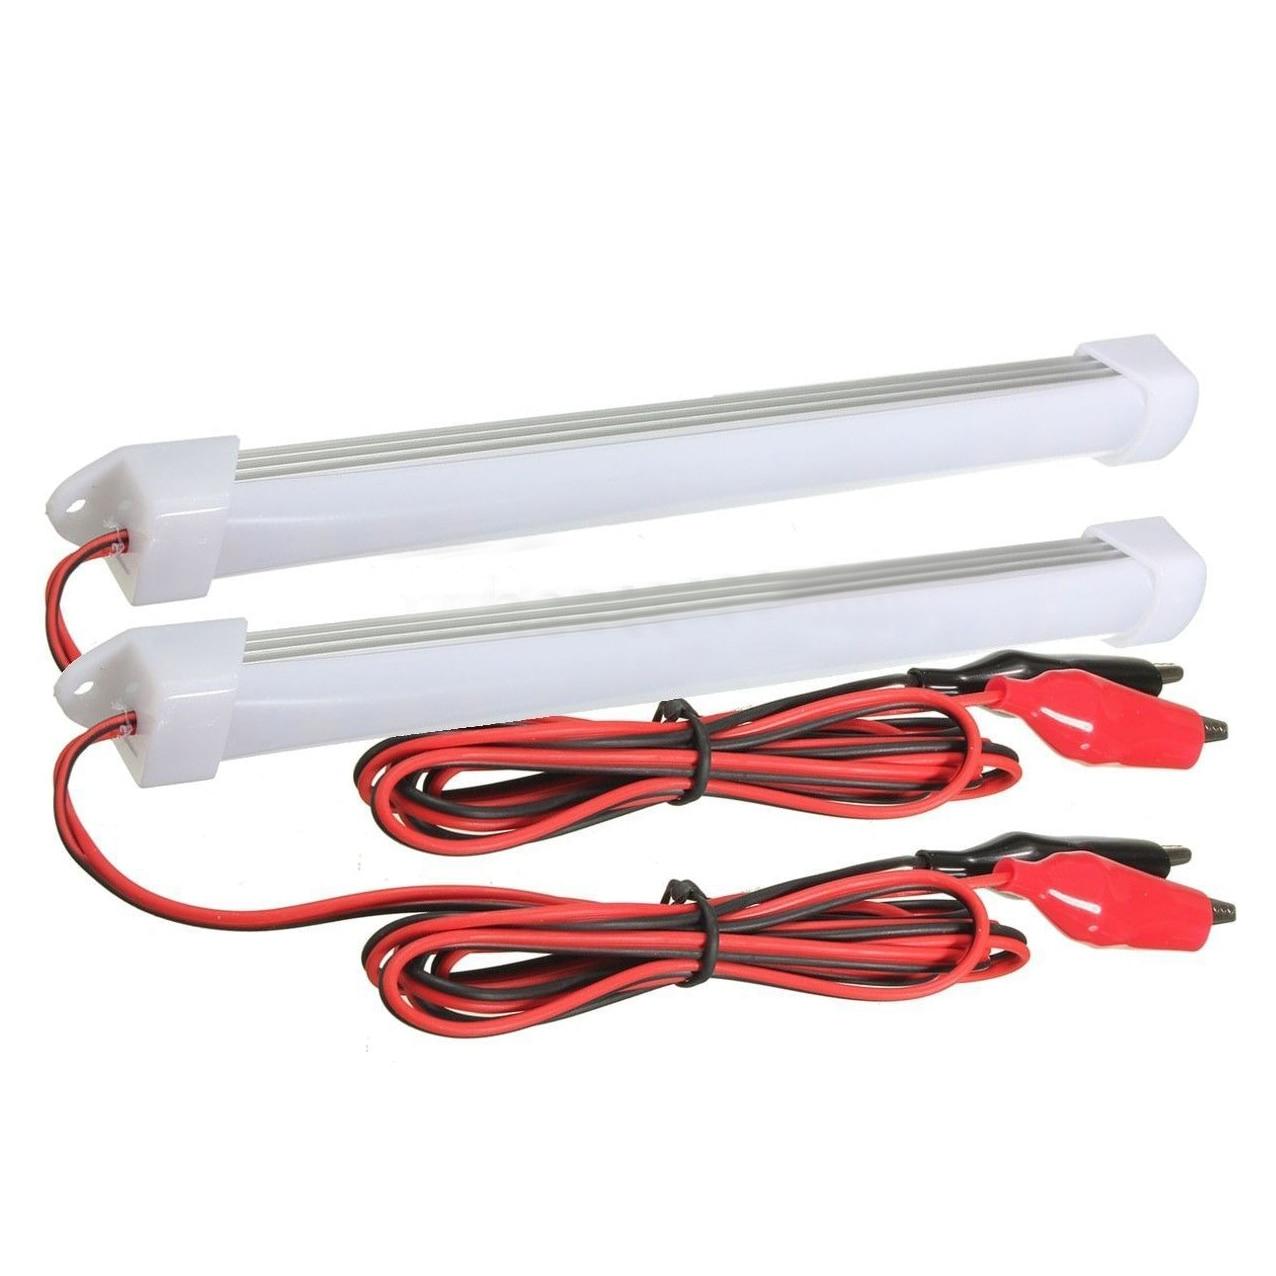 2x 12V Car LED SMD Interior Light Bar Tube Strip Lamp Van Boat Caravan Motorhome Cold White